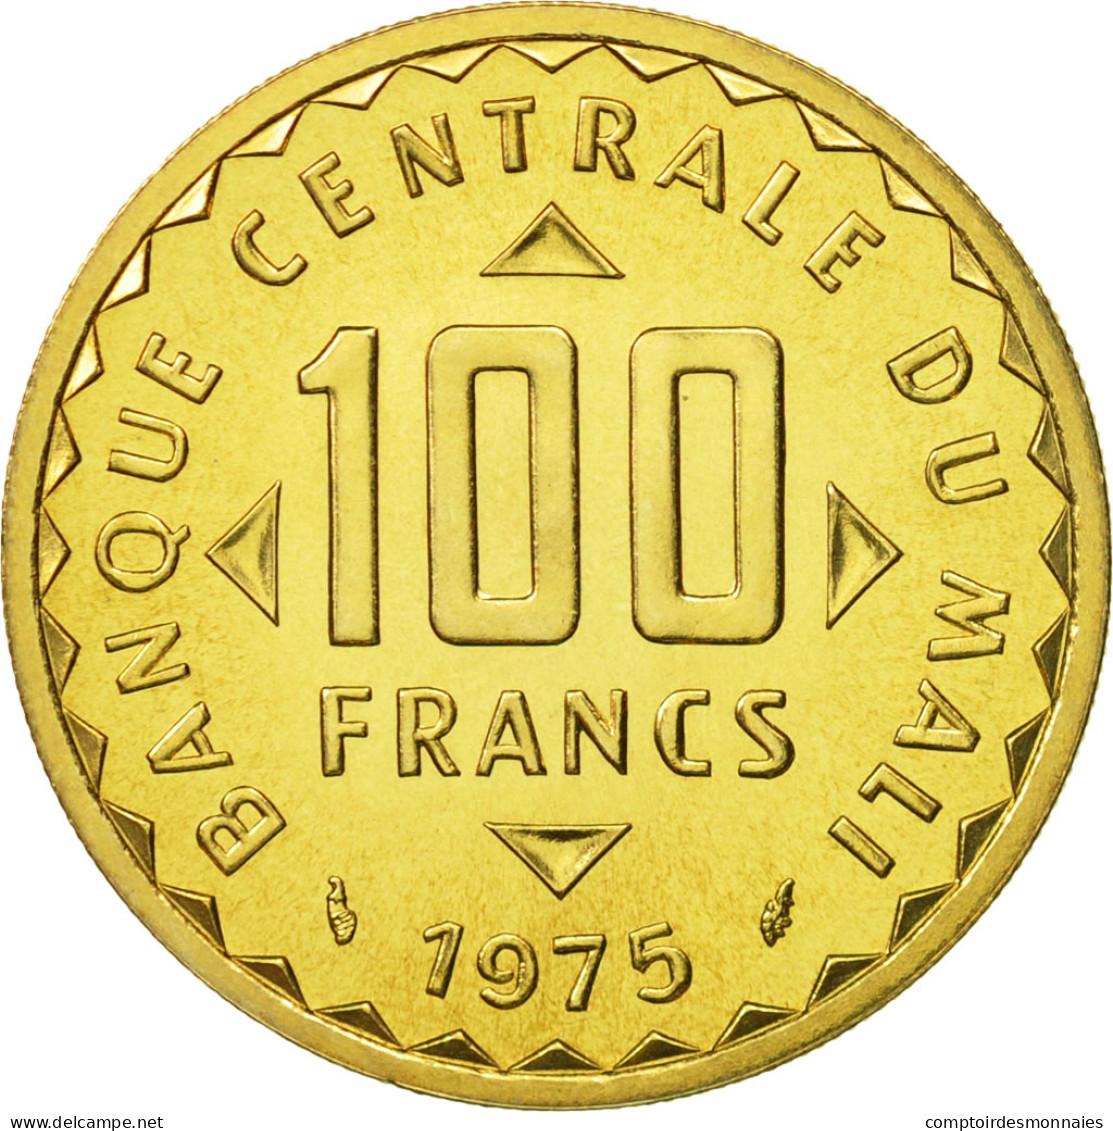 Mali, 100 Francs, 1975, FDC, Nickel-brass, KM:E2 - Mali (1962-1984)